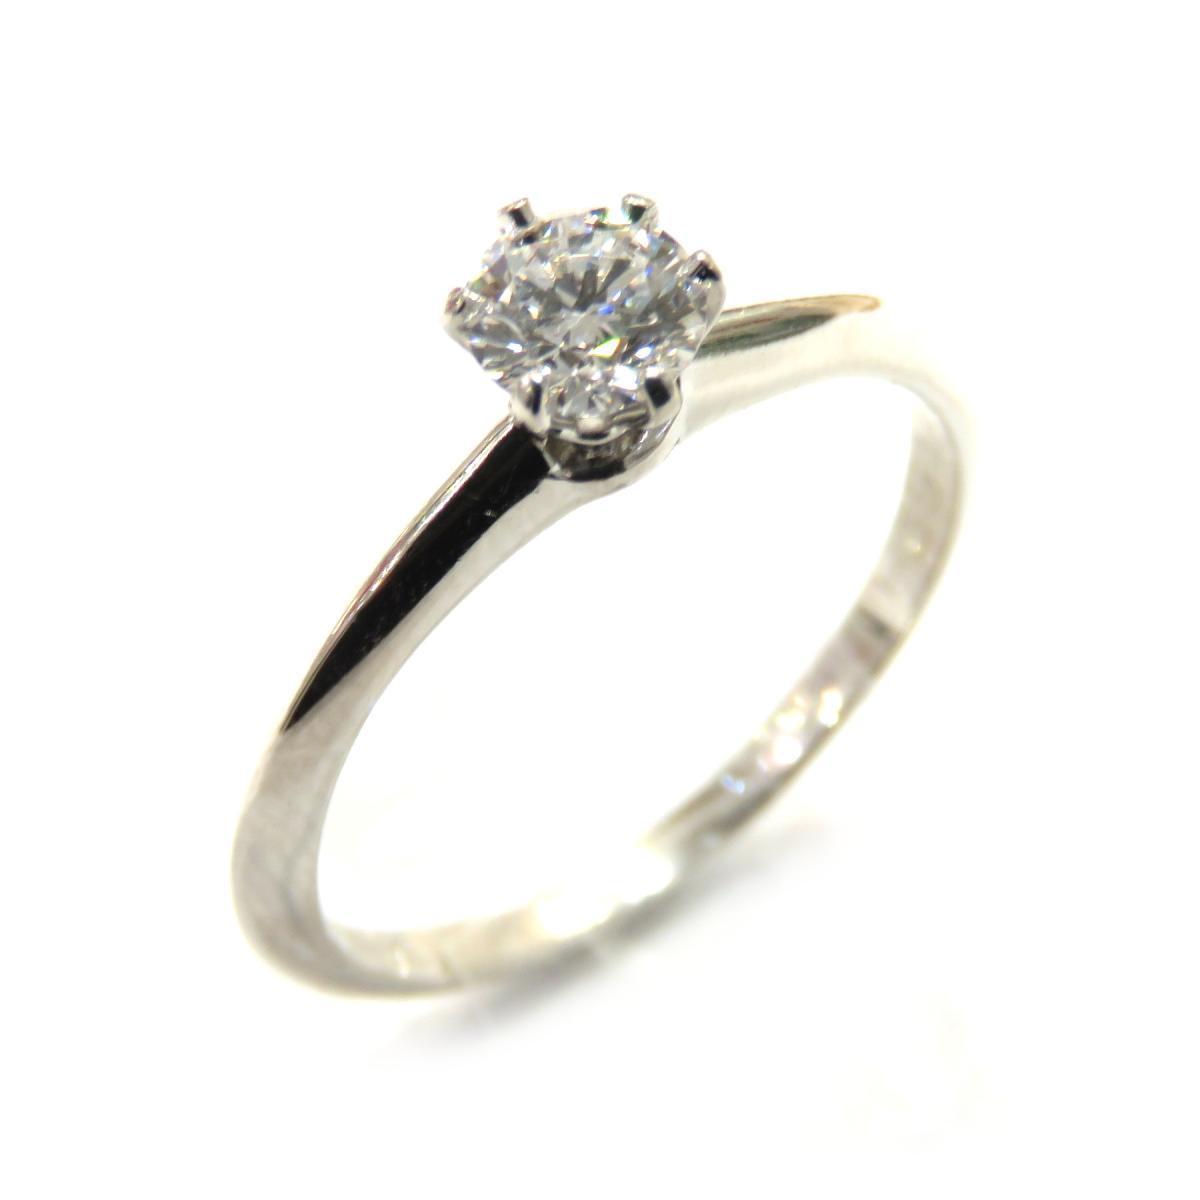 TIFFANY & CO Solitaire Ring Ladies PT950 Diamond (D0.29ct) No. 11